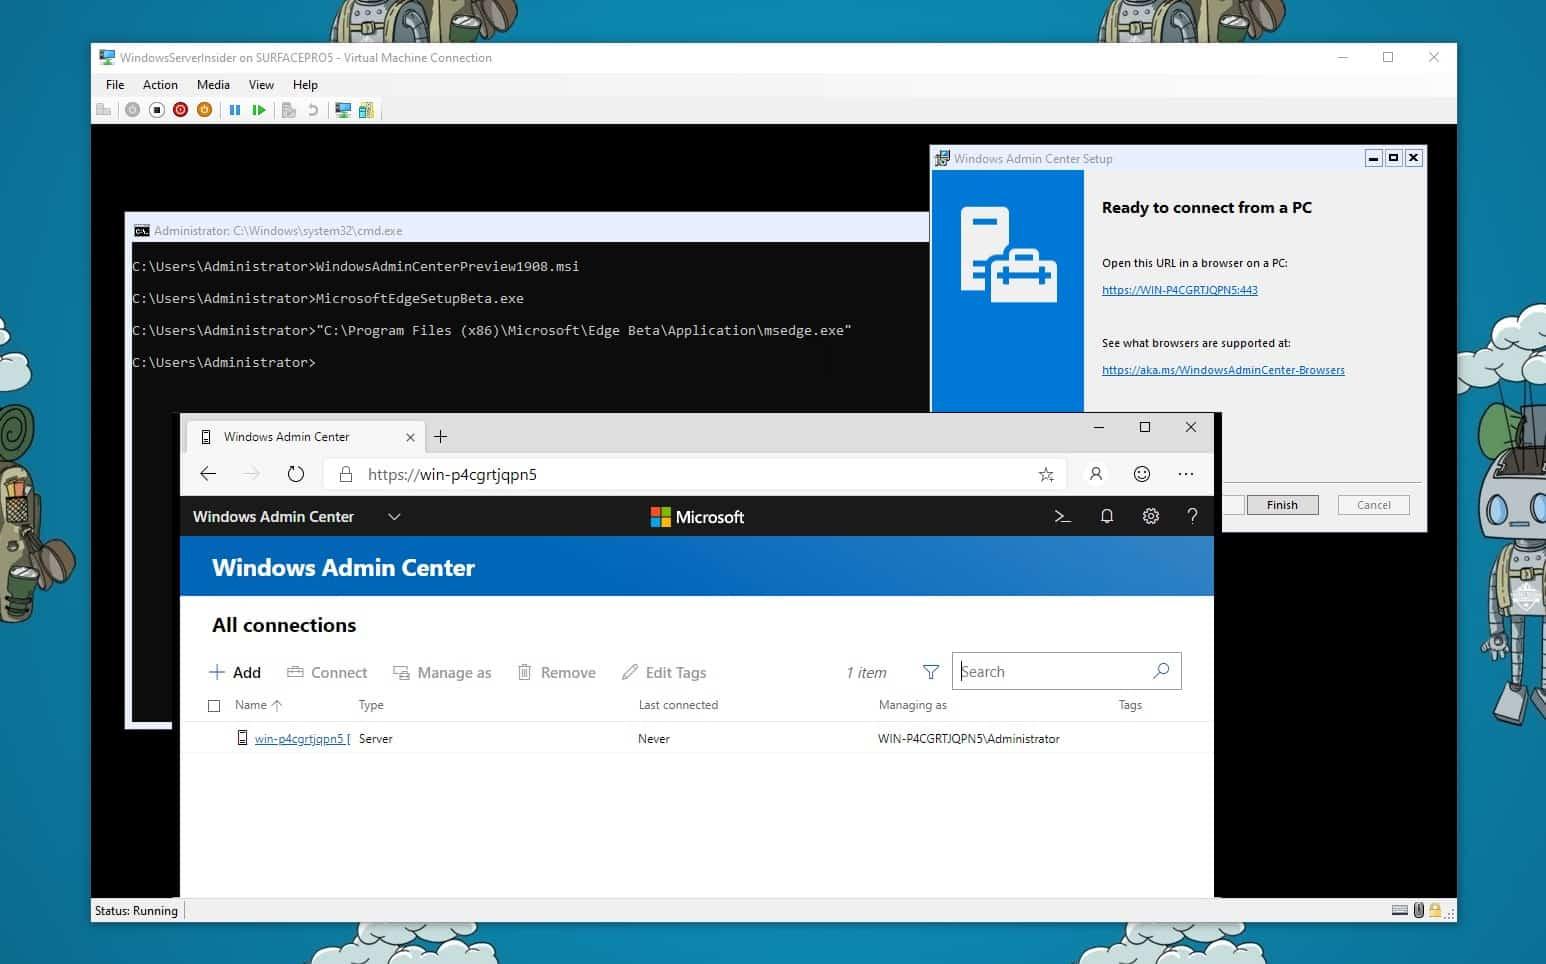 Run Windows Admin Center on Windows Server Core